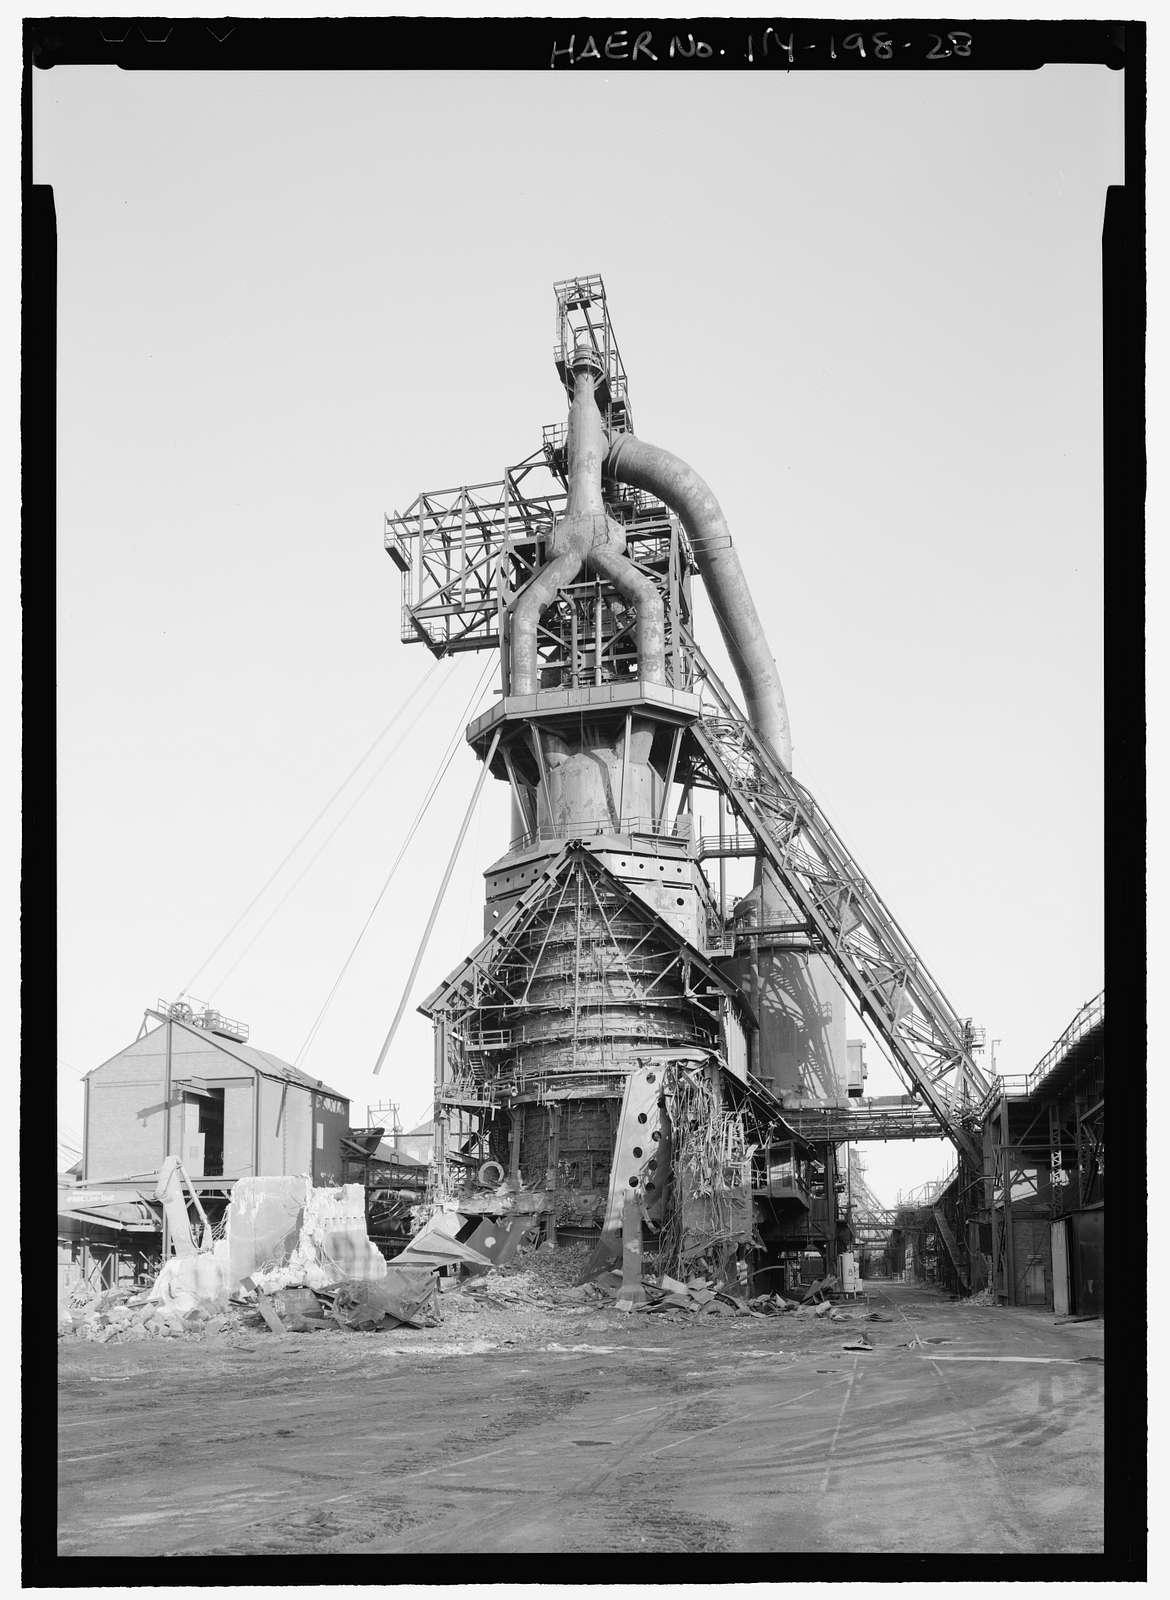 Bethlehem Steel Corporation, Lackawanna Plant, Route 5 on Lake Erie, Buffalo, Erie County, NY